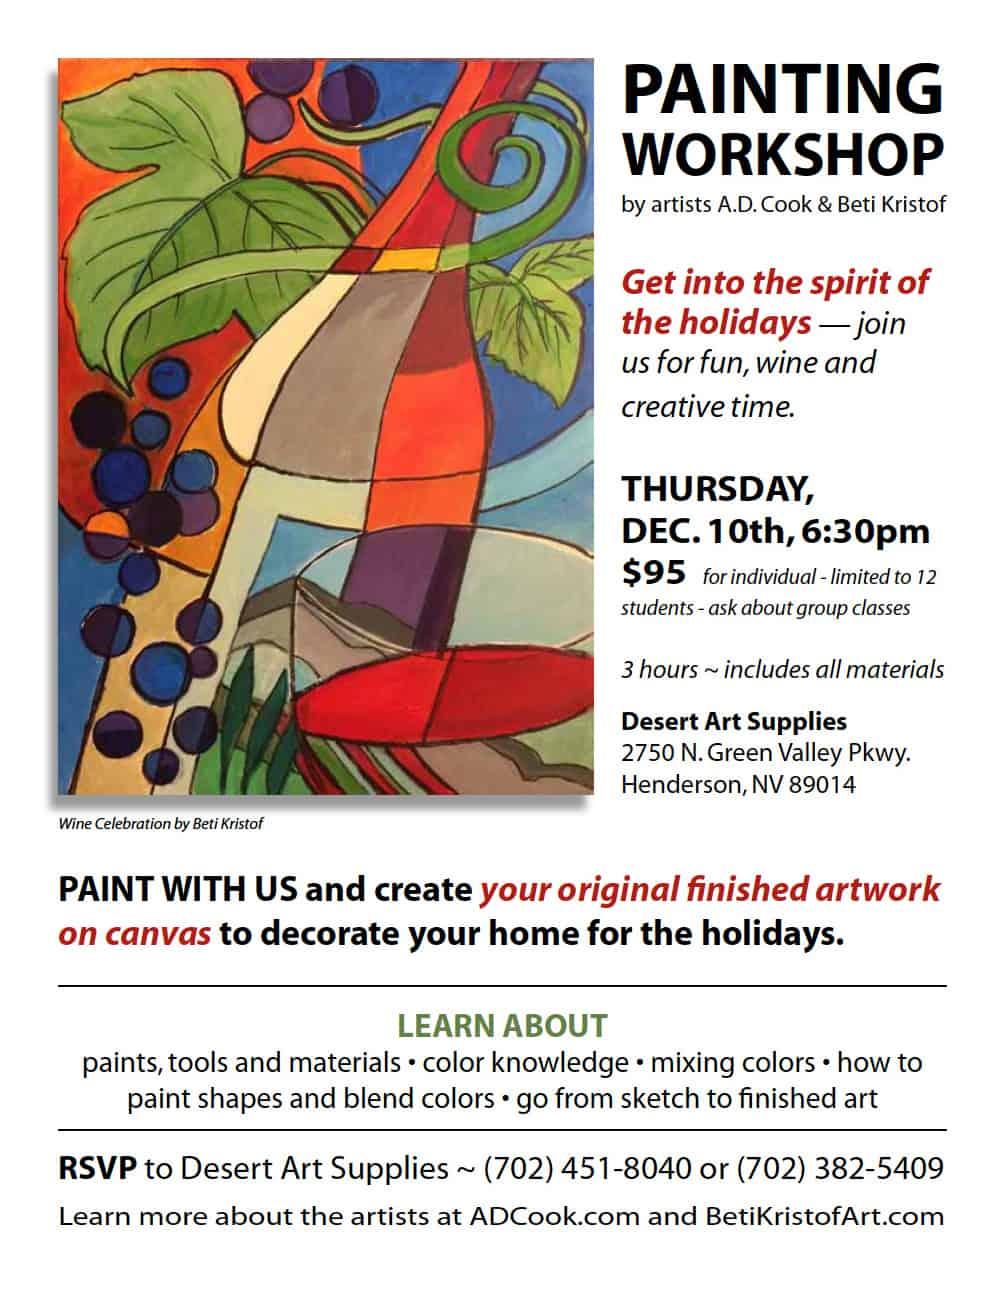 Painting Workshop Flyer